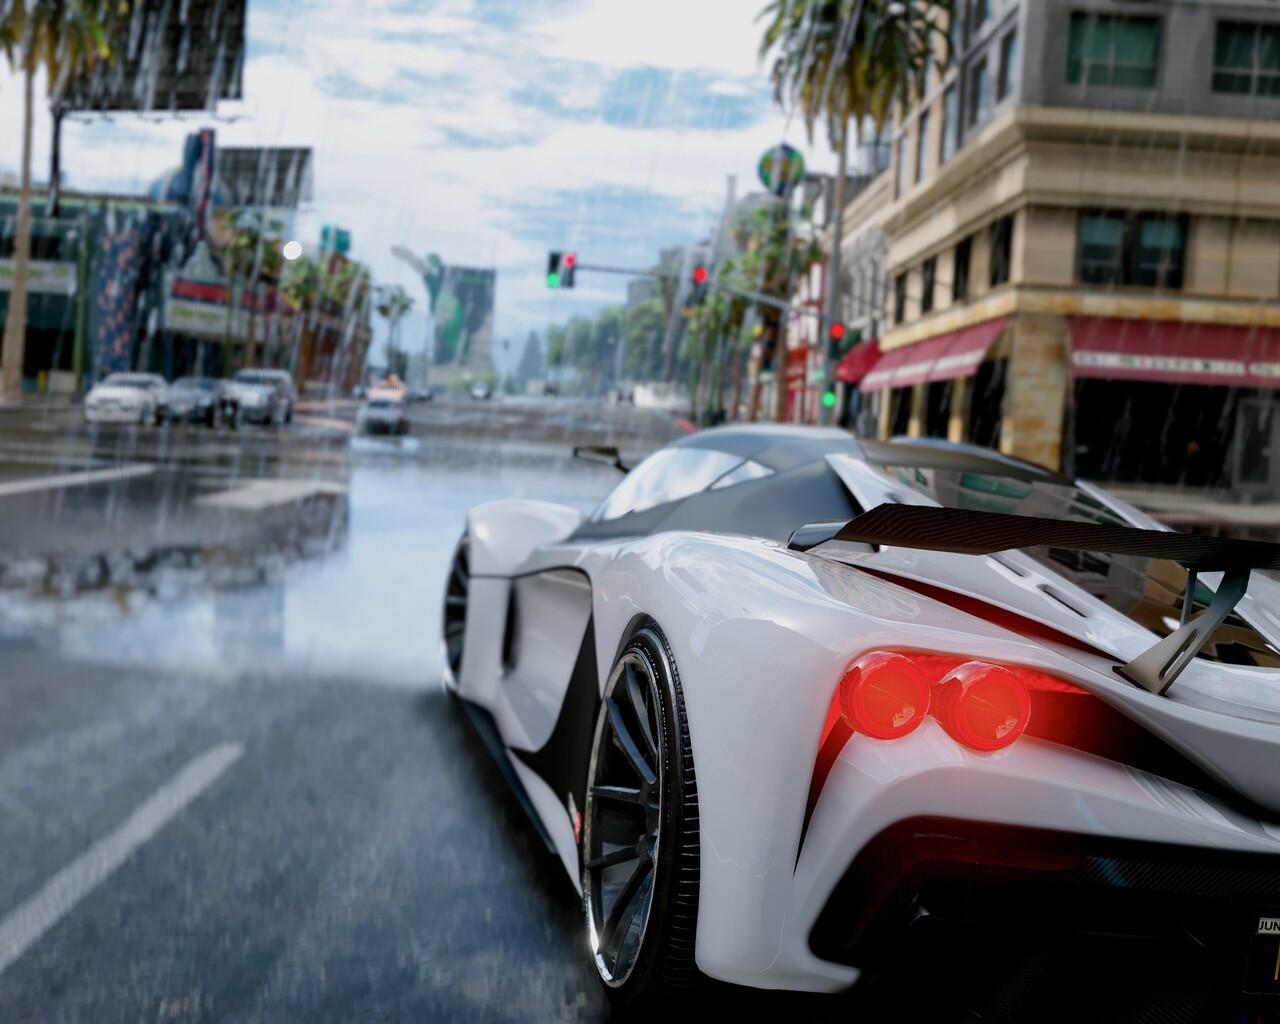 1280x1024 GTA 5 Online Turismo RG 1280x1024 Resolution HD ...